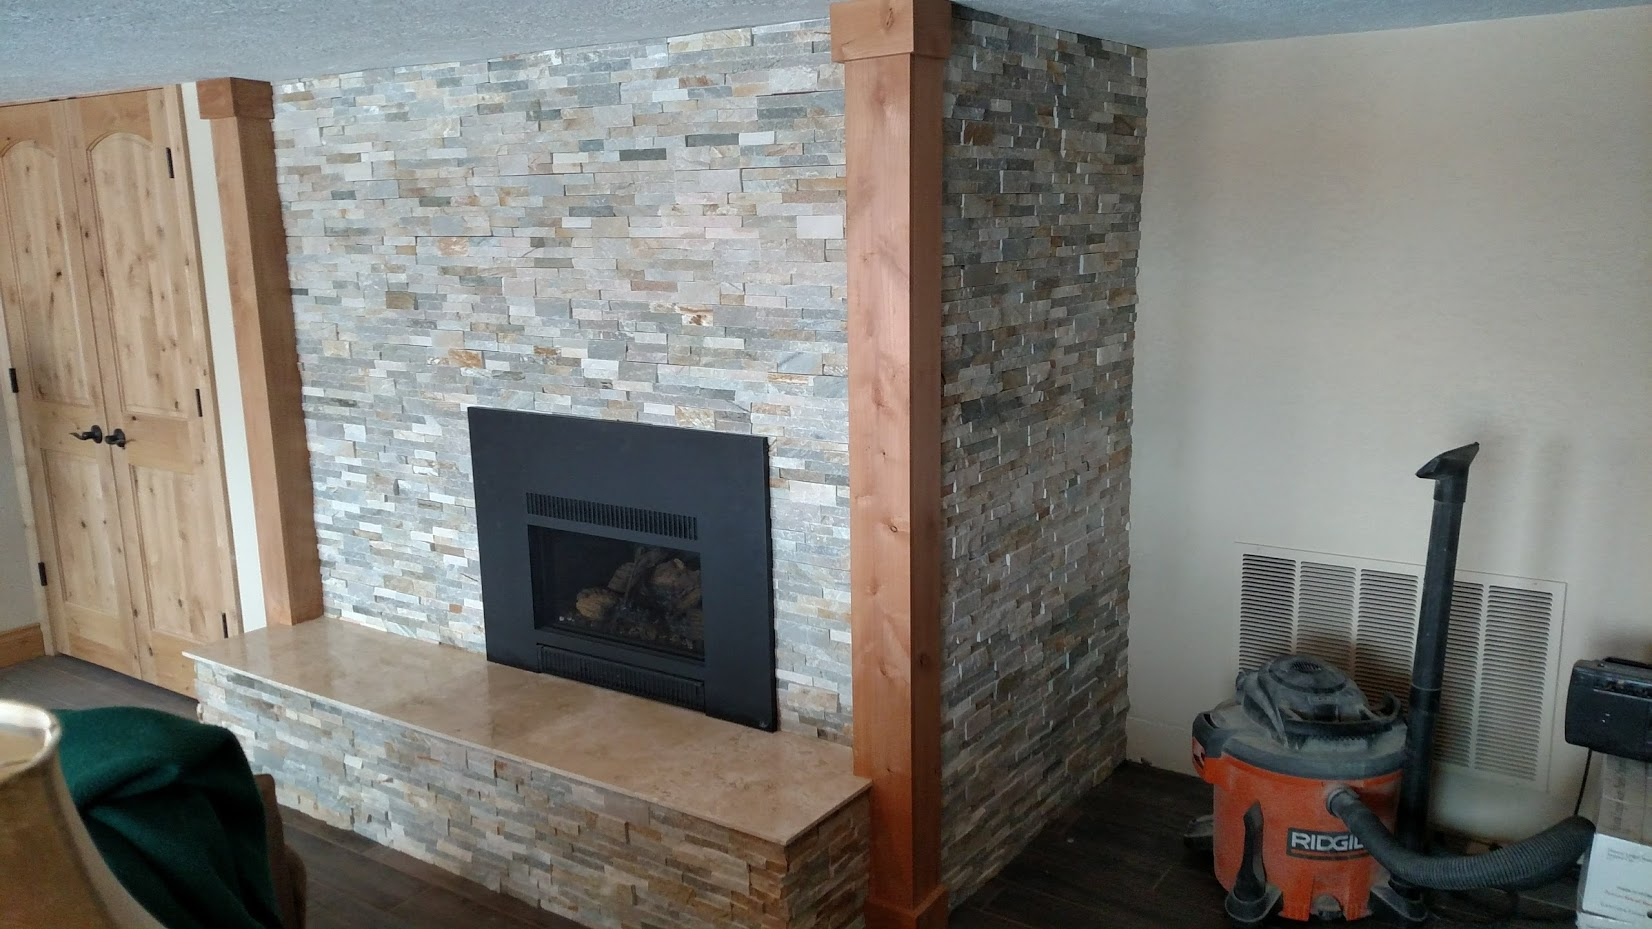 Tile Installation And Repair Bathroom Remodeling The Tile Smith - Bathroom remodeling missoula mt